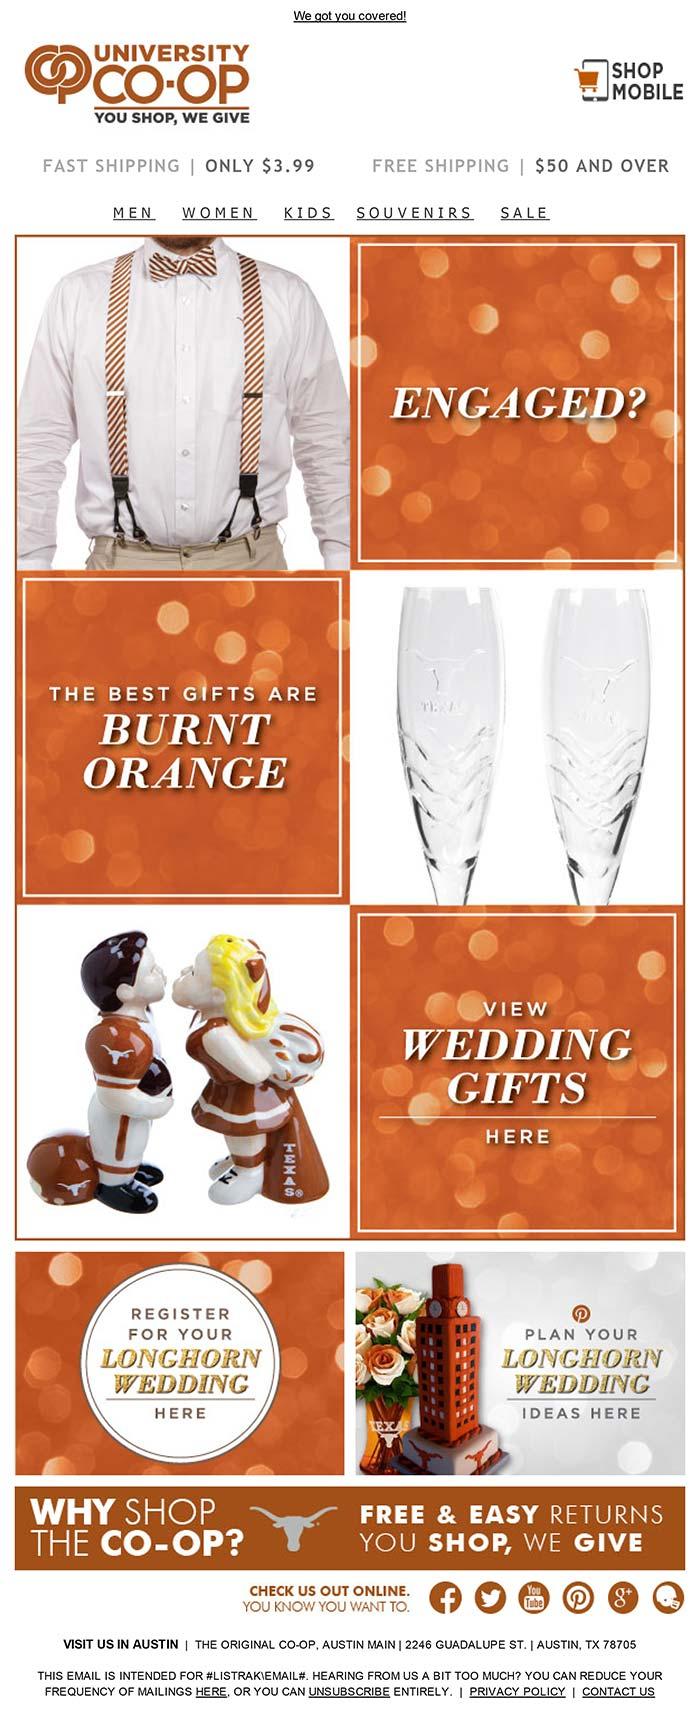 Longhorn Wedding Email